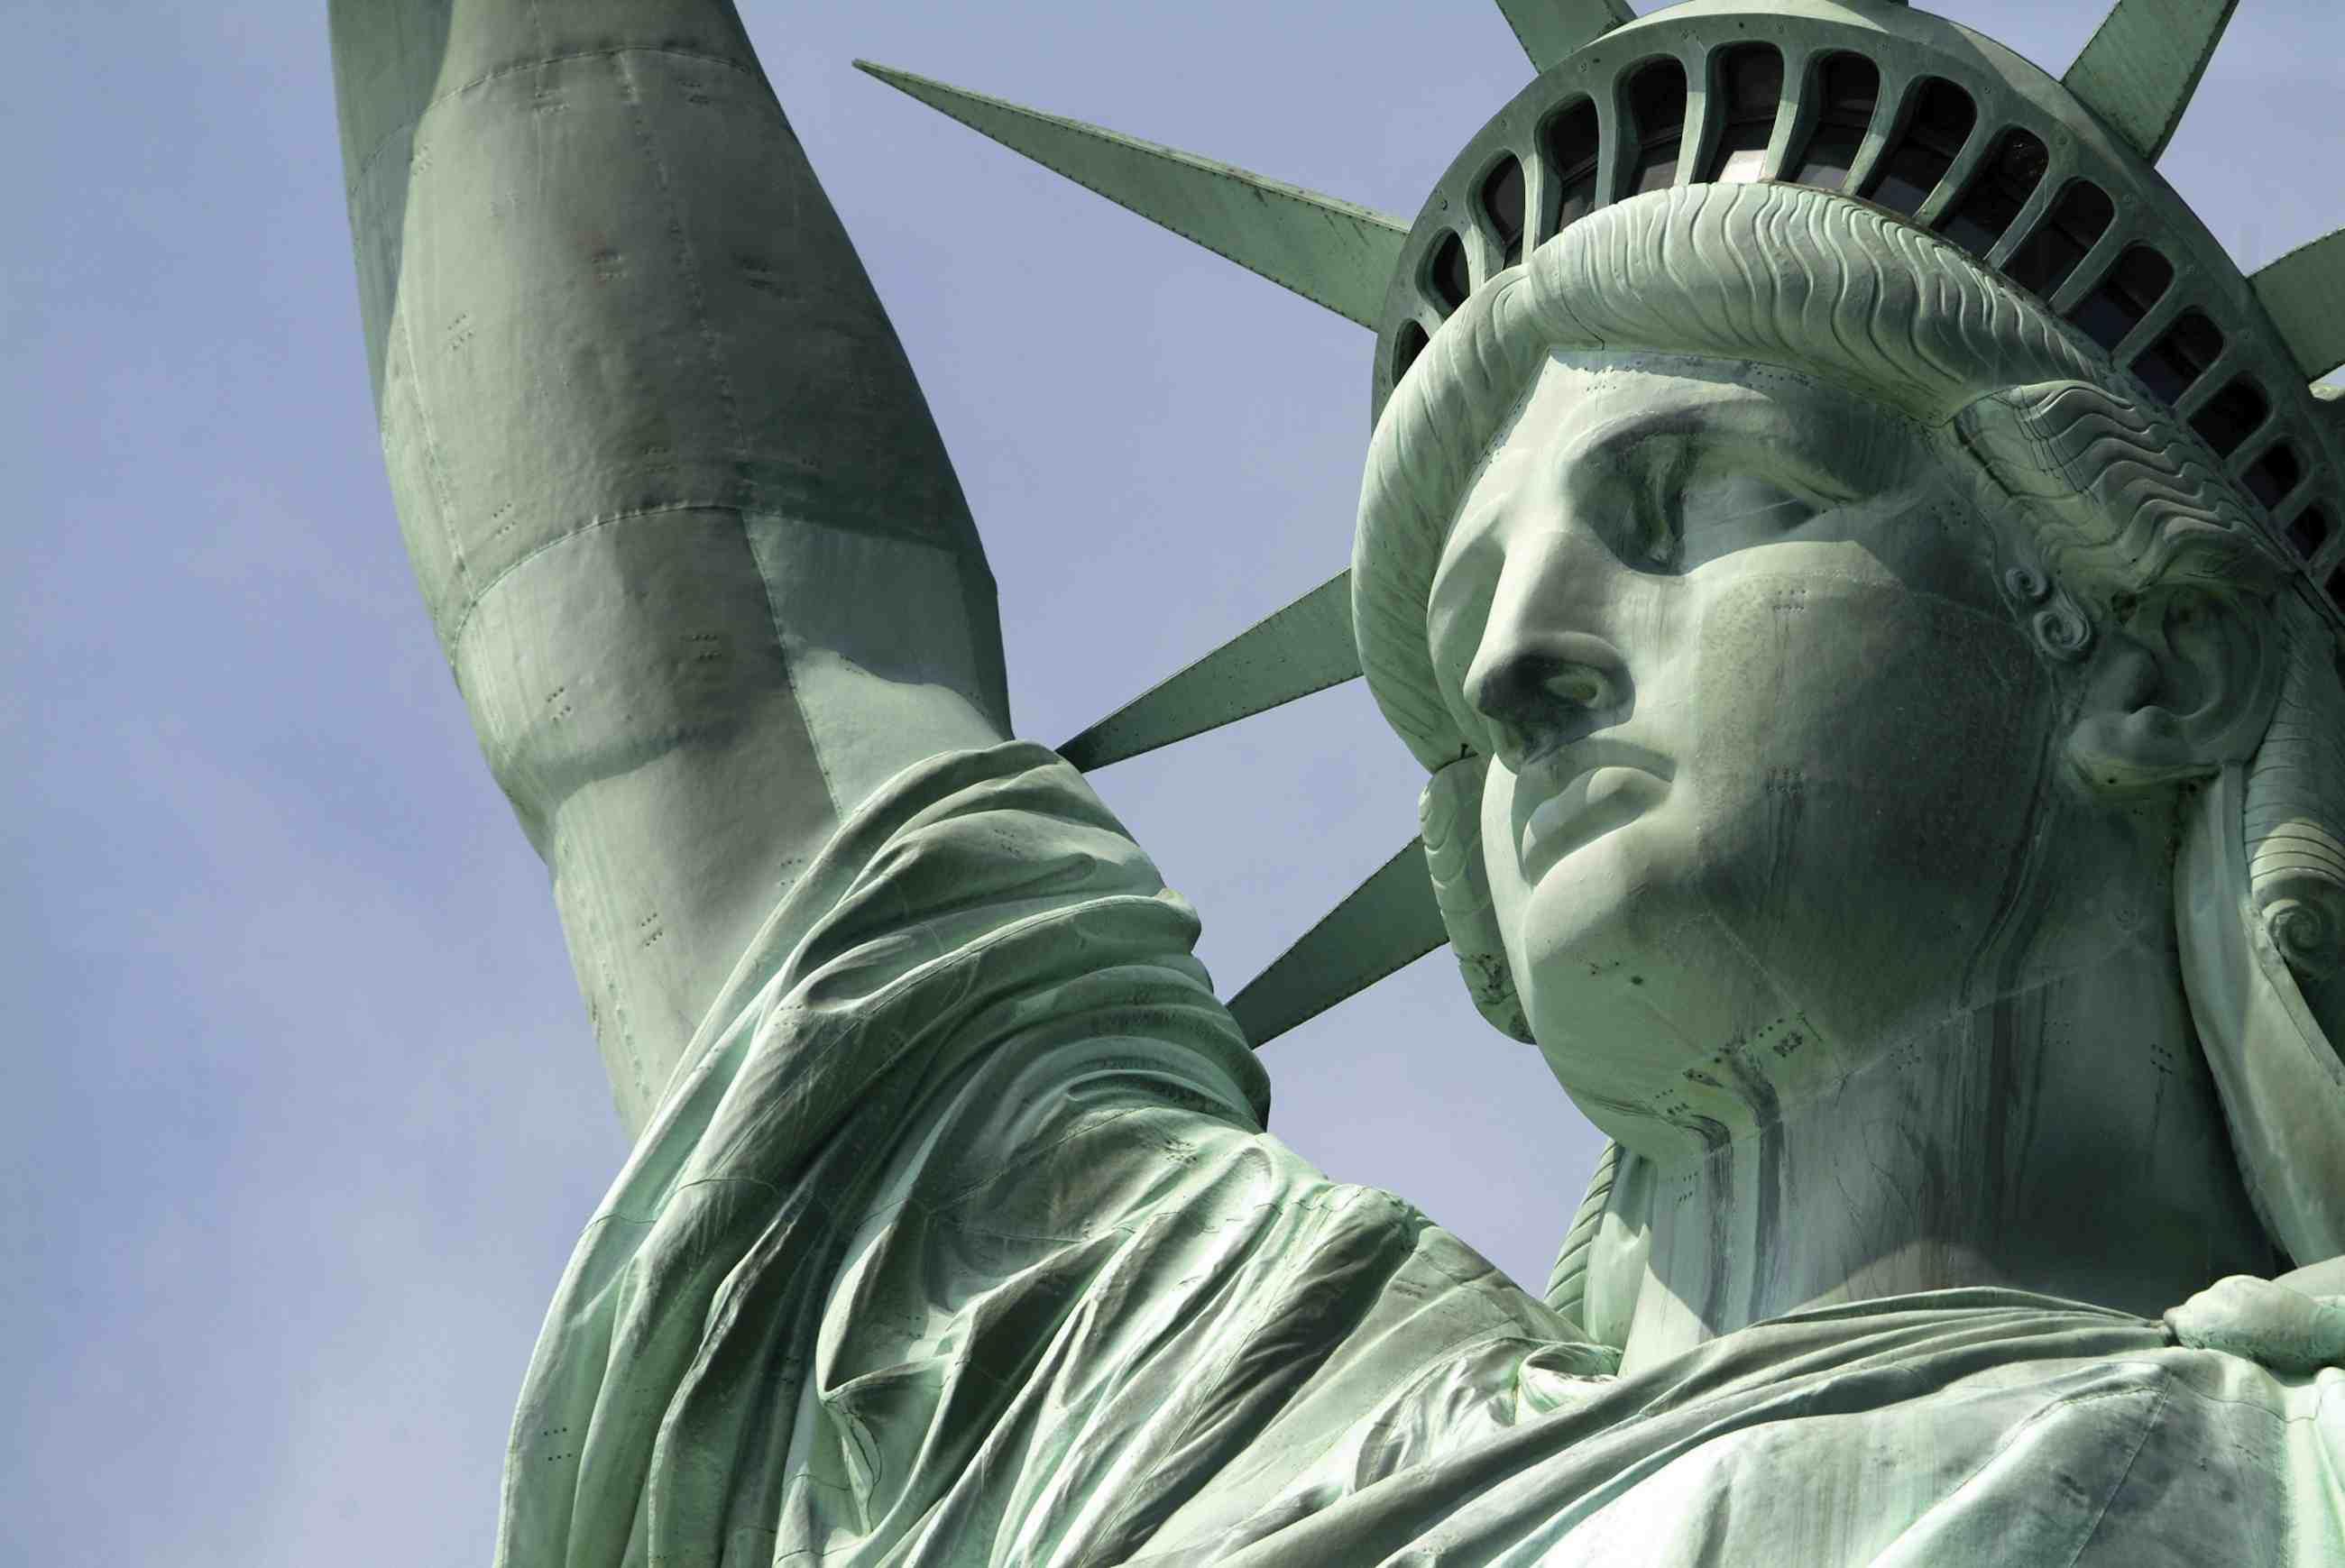 Statue-of-Liberty-Face-City-Pass.jpg